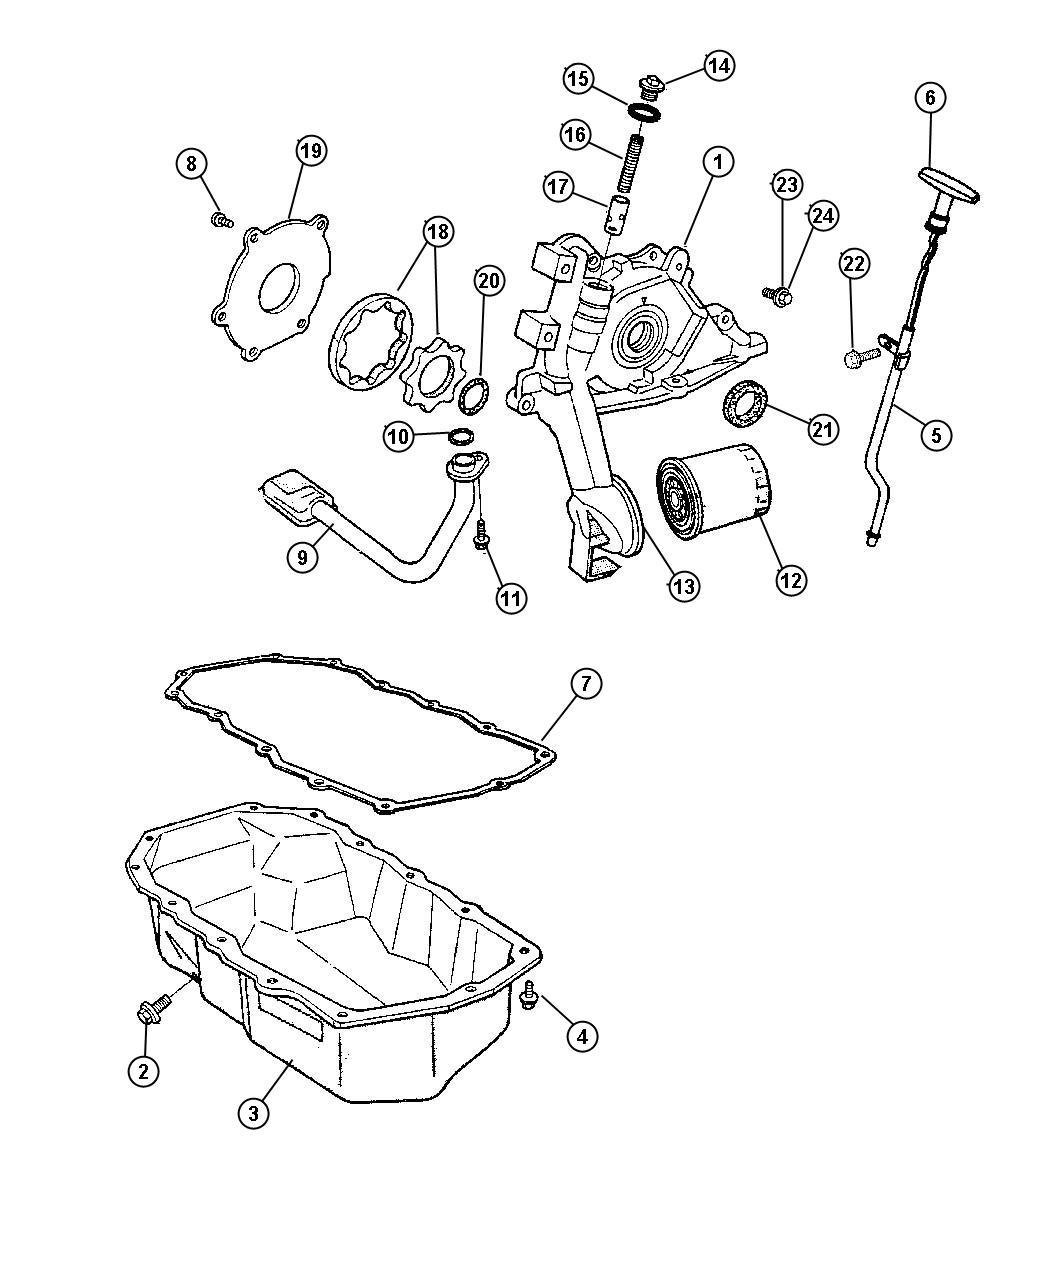 Chrysler Voyager Pump Engine Oil Edz Oiling